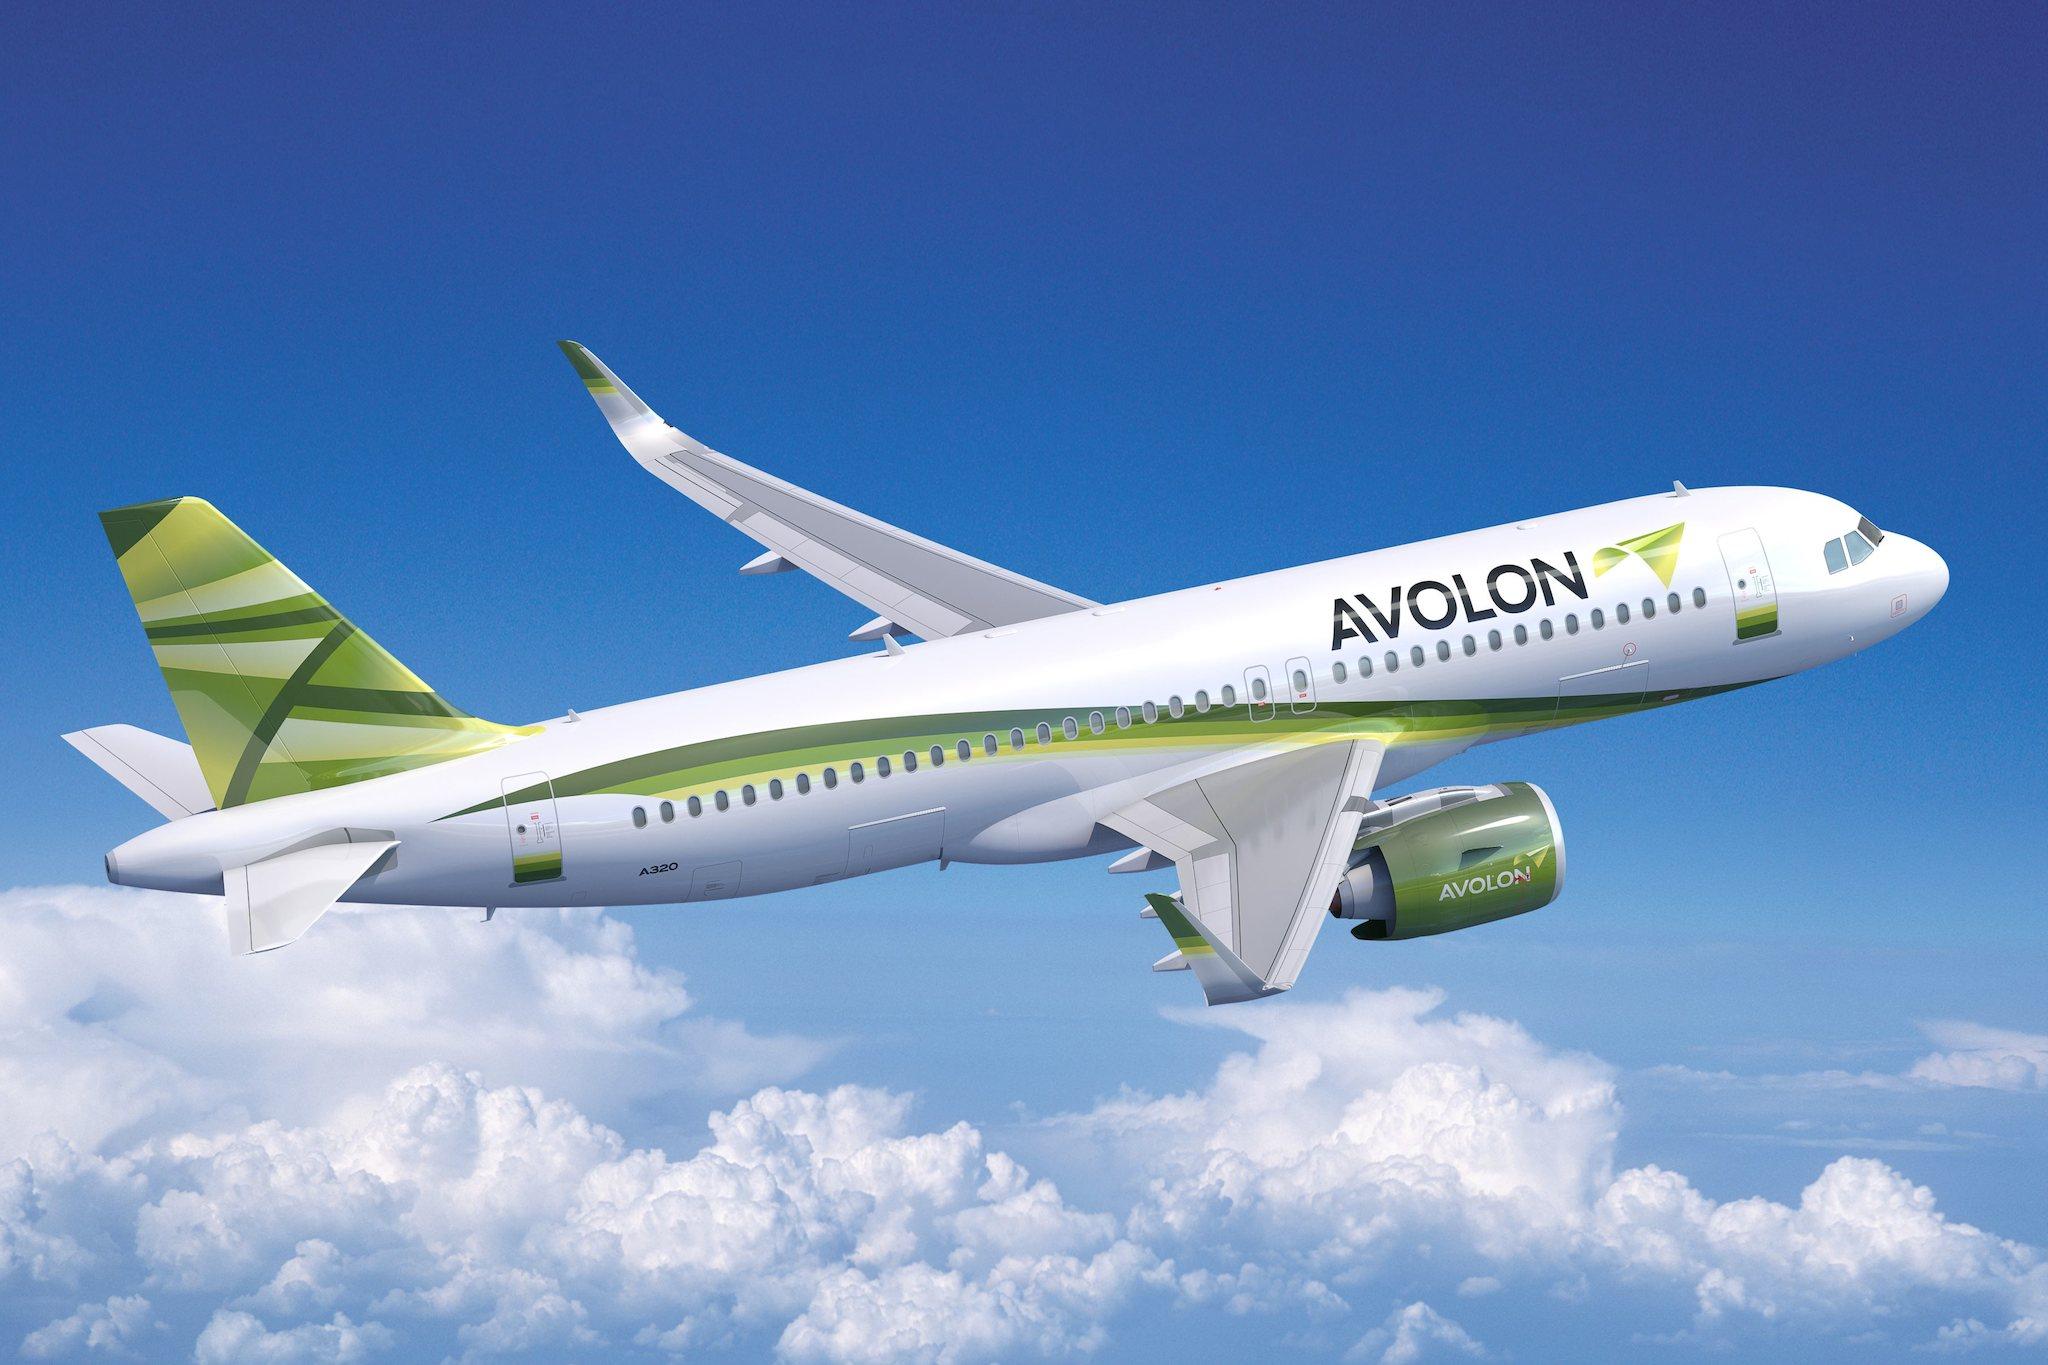 Airbus A320neo Avolon